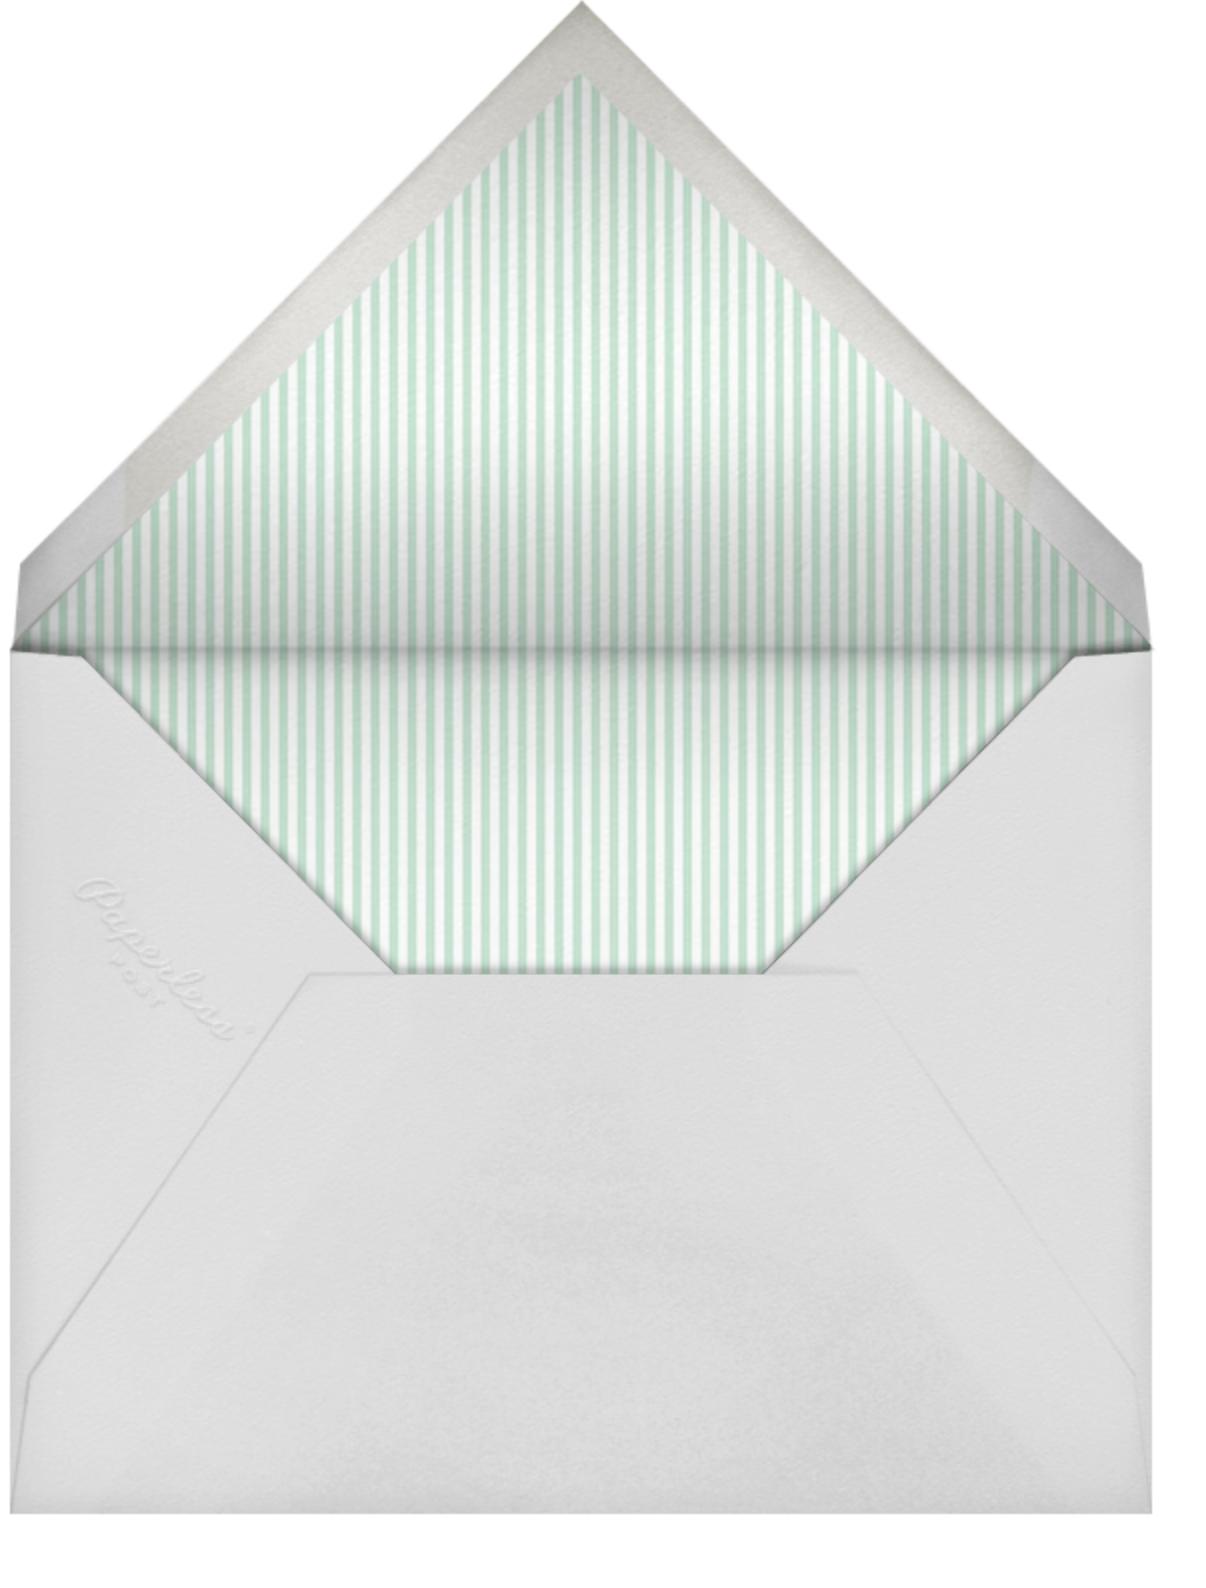 Here Comes the Stork - Gray - Sugar Paper - Baby shower - envelope back